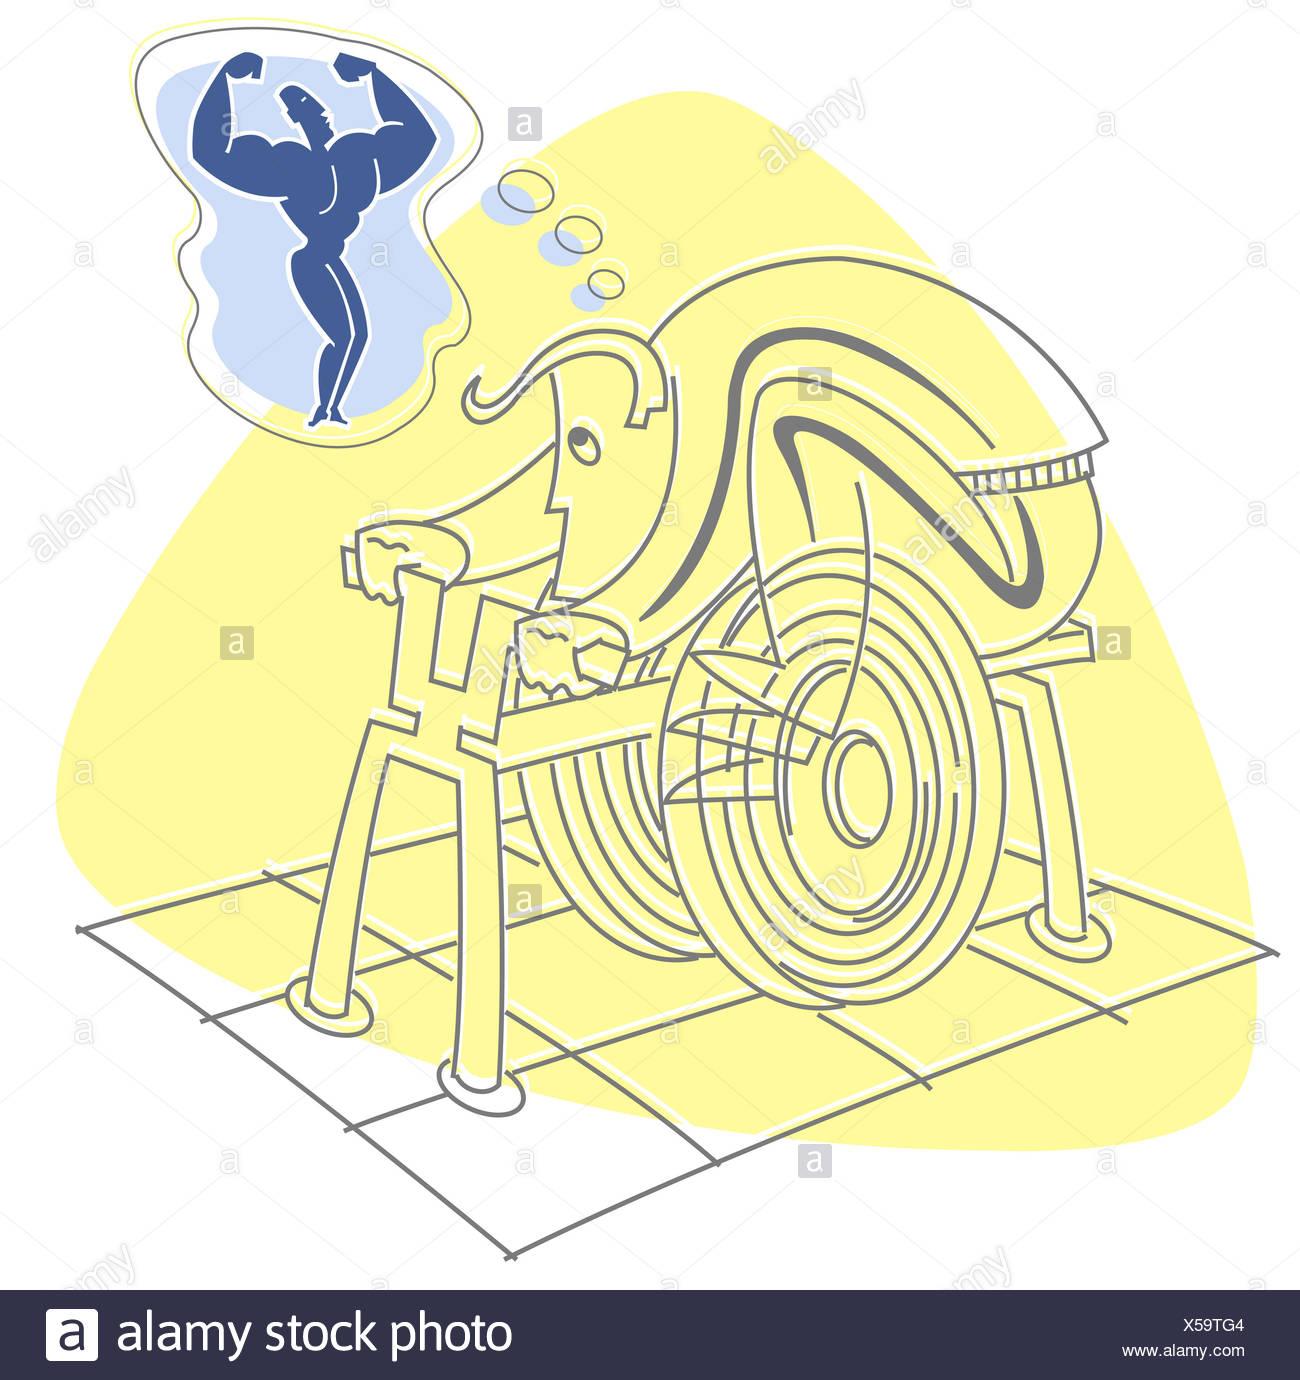 Man using home exerciser - Stock Image